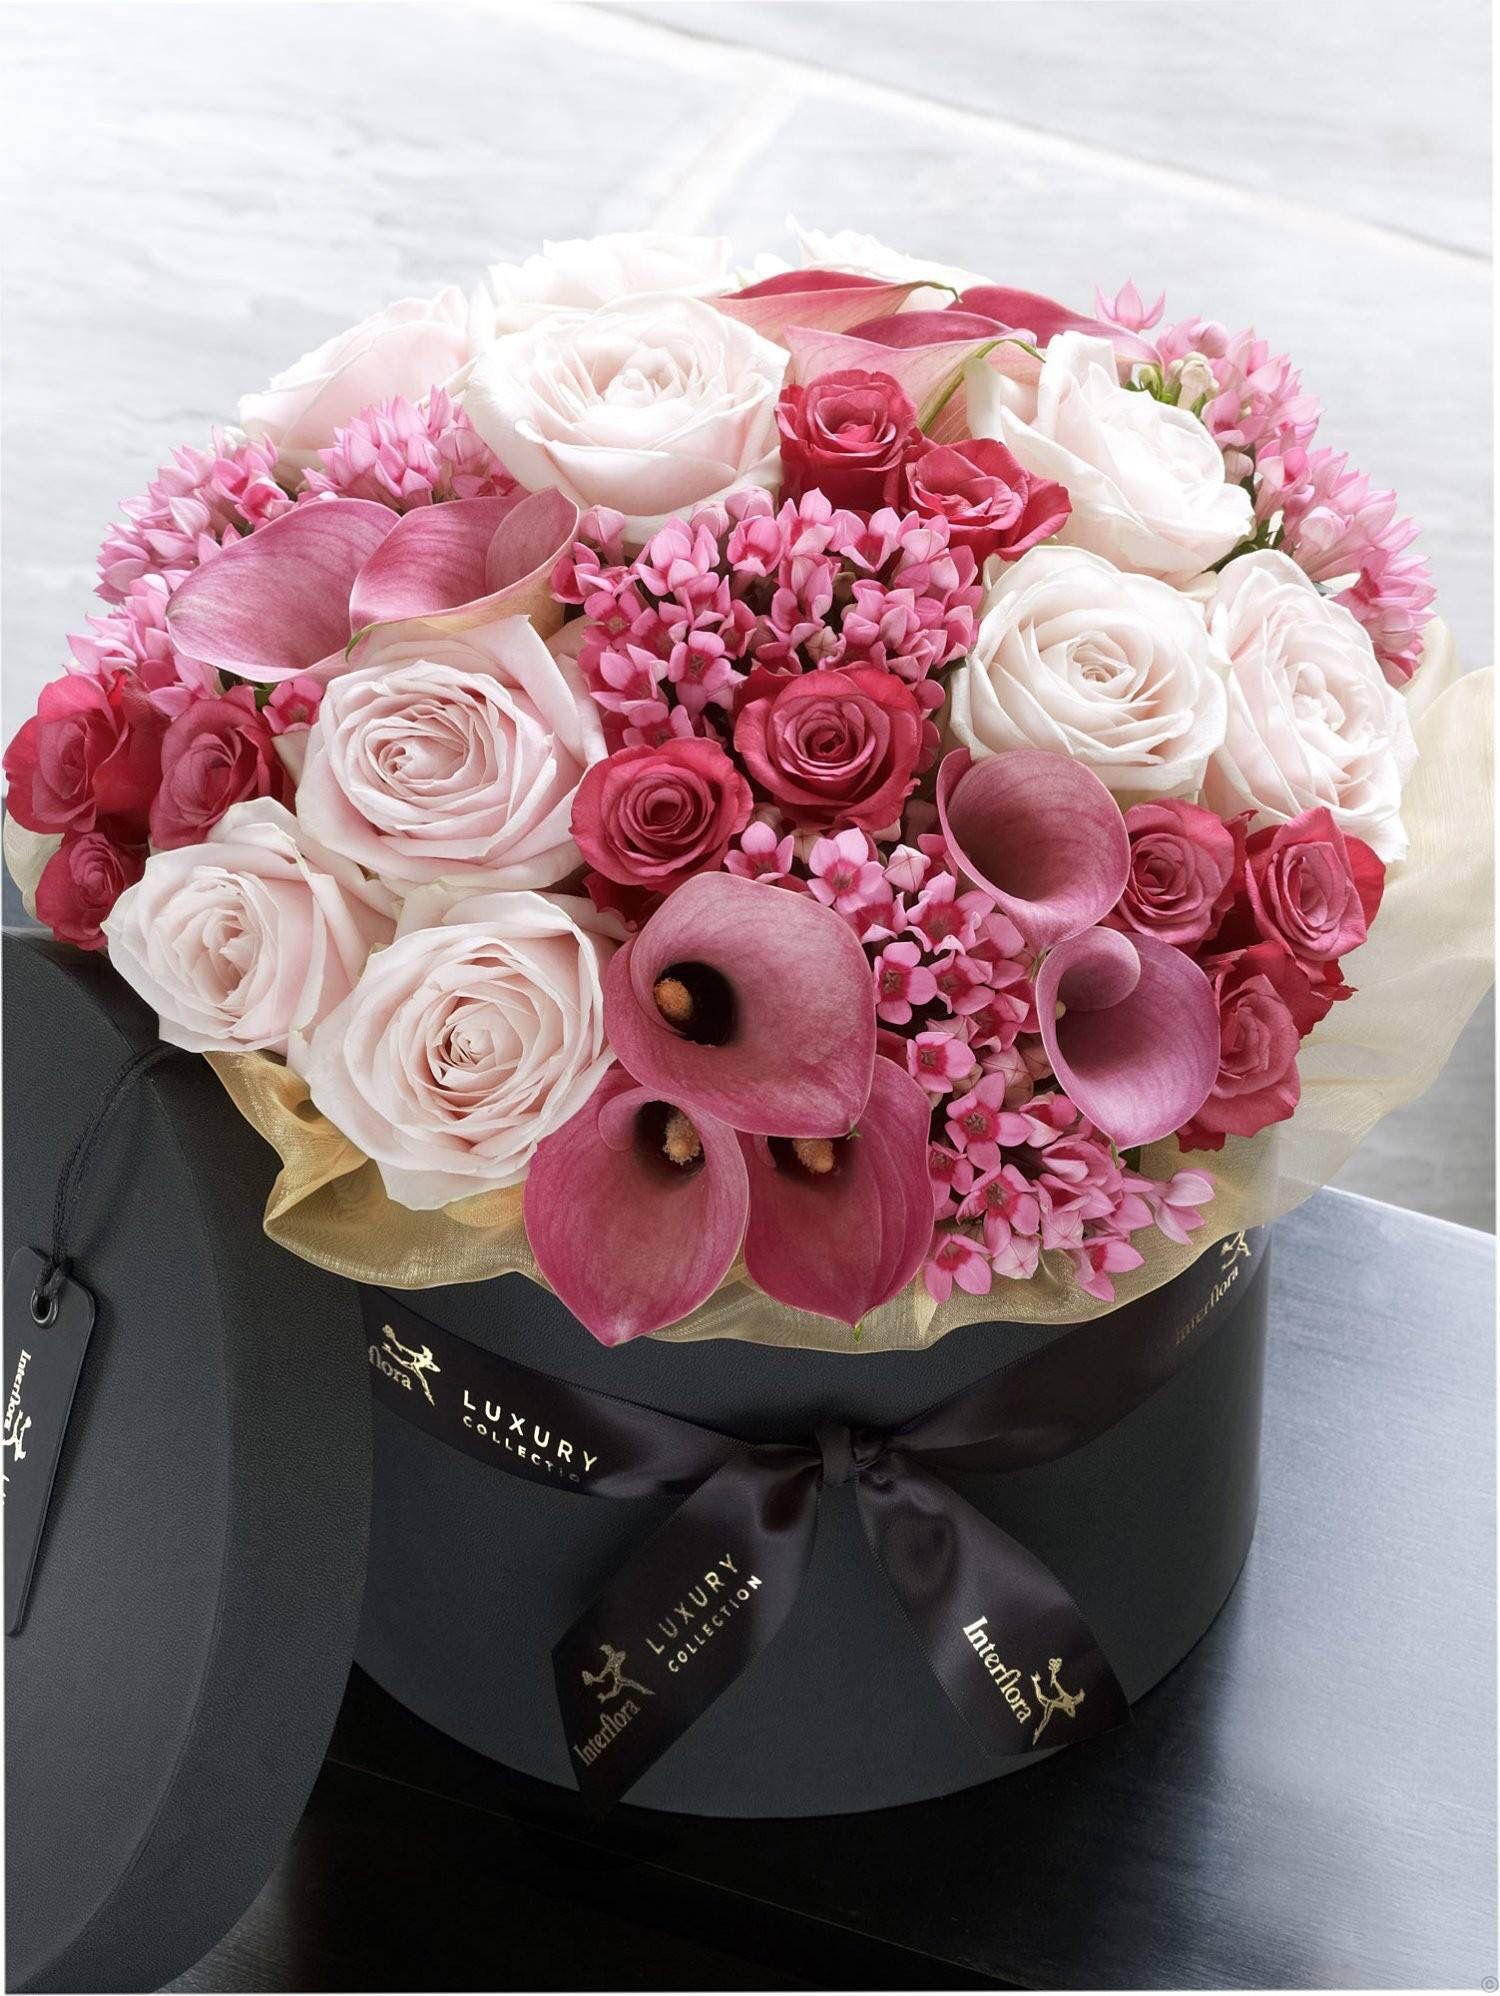 spring flowers in a black hat box Flower arrangements